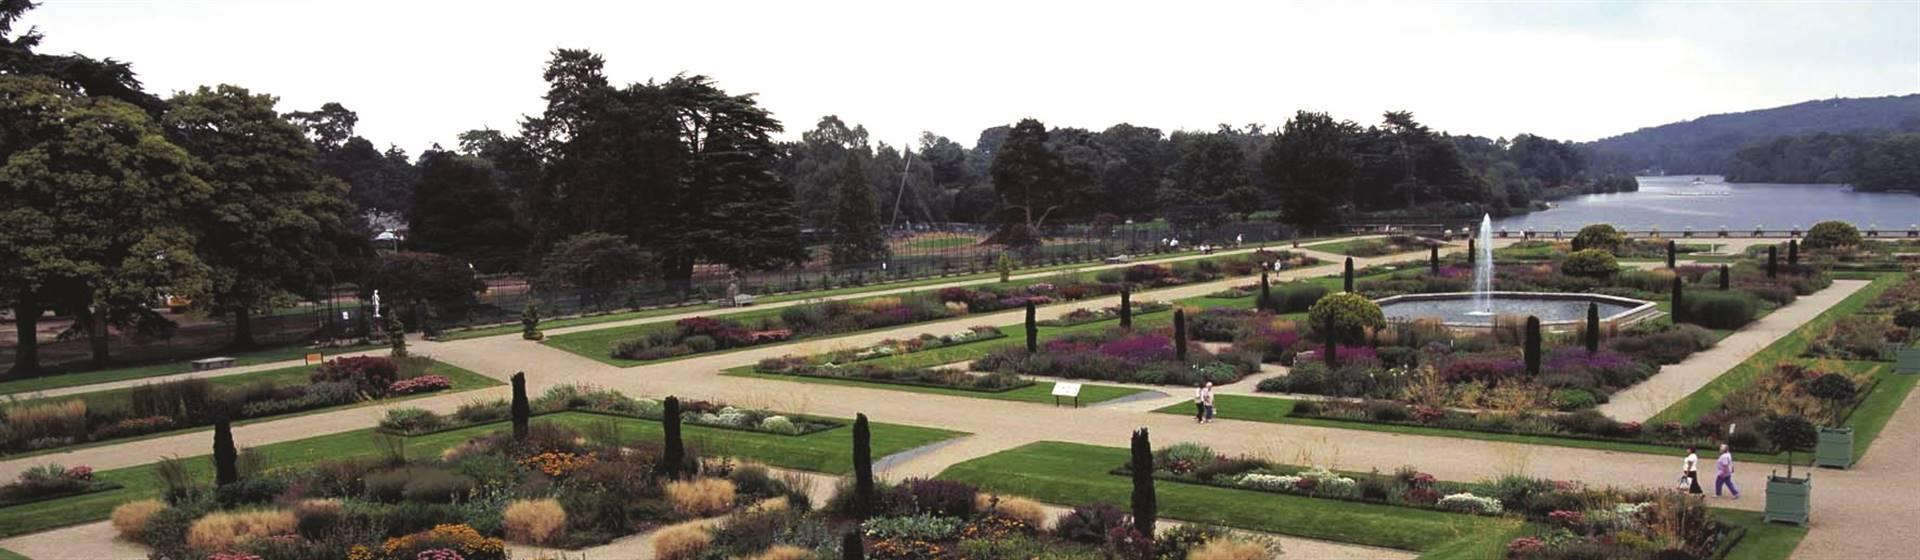 Italian Trentham Gardens